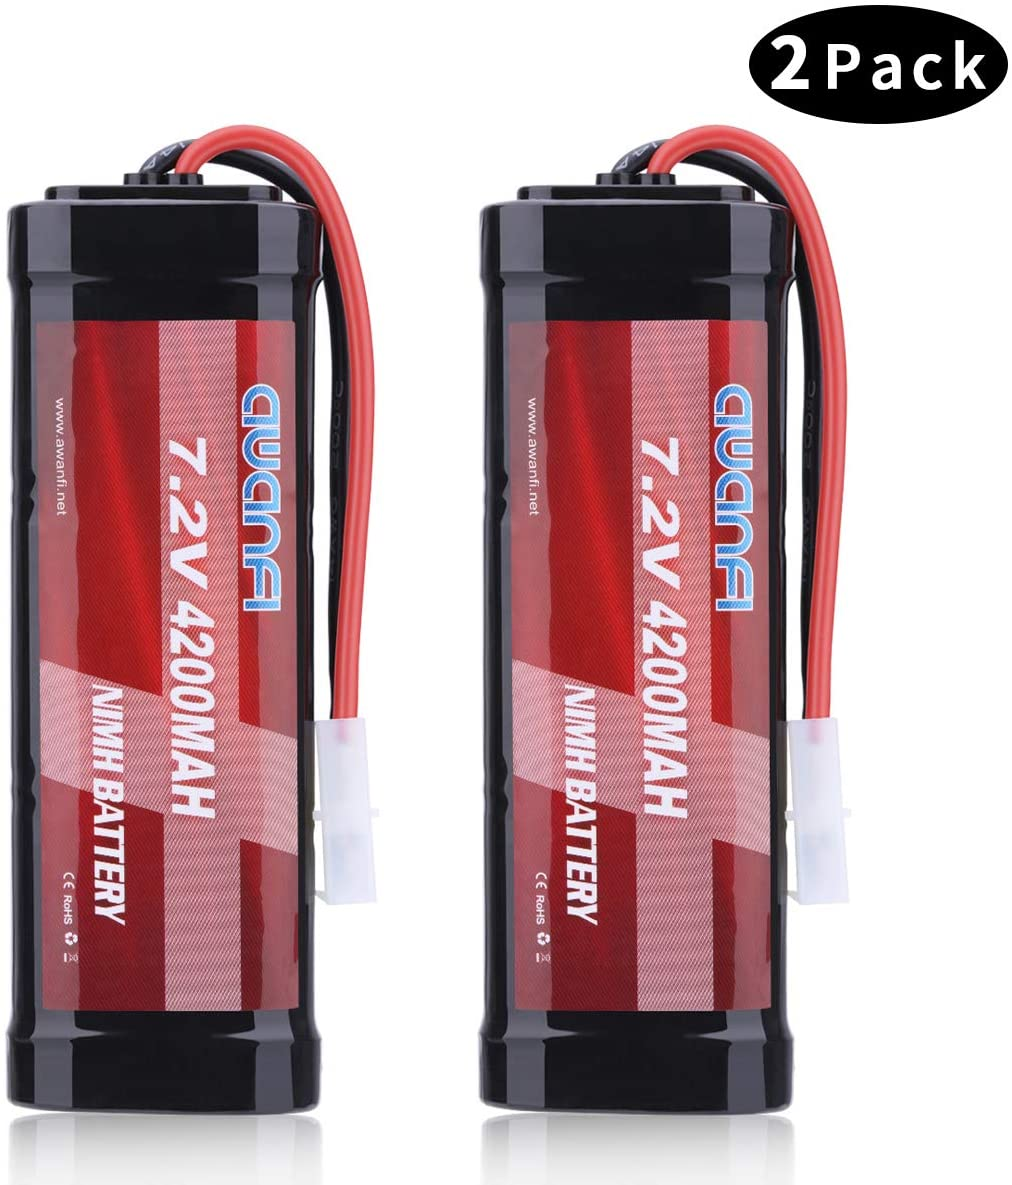 AWANFI 7.2V 4200mAh NiMH Battery High Power RC Car Battery with Tamiya Connector for RC Car RC Truck Traxxas LOSI Associated HPI Kyosho Tamiya Hobby(2Pack)